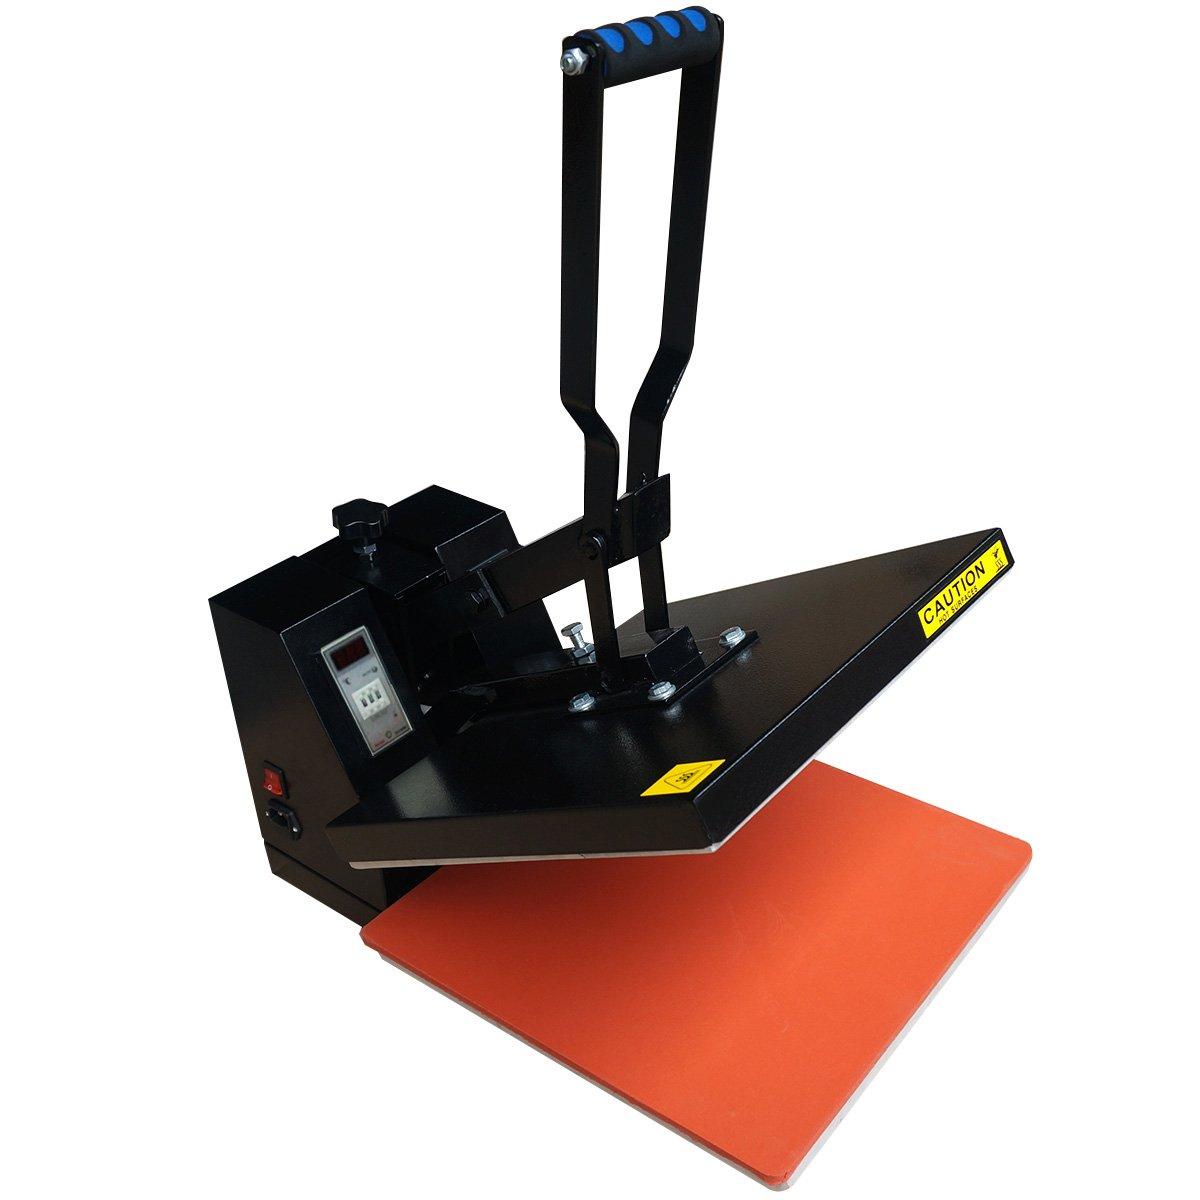 FDS 40x50 Heat Press Machine T-shirt Photo Clam Sublimation Pressing Printing Kit